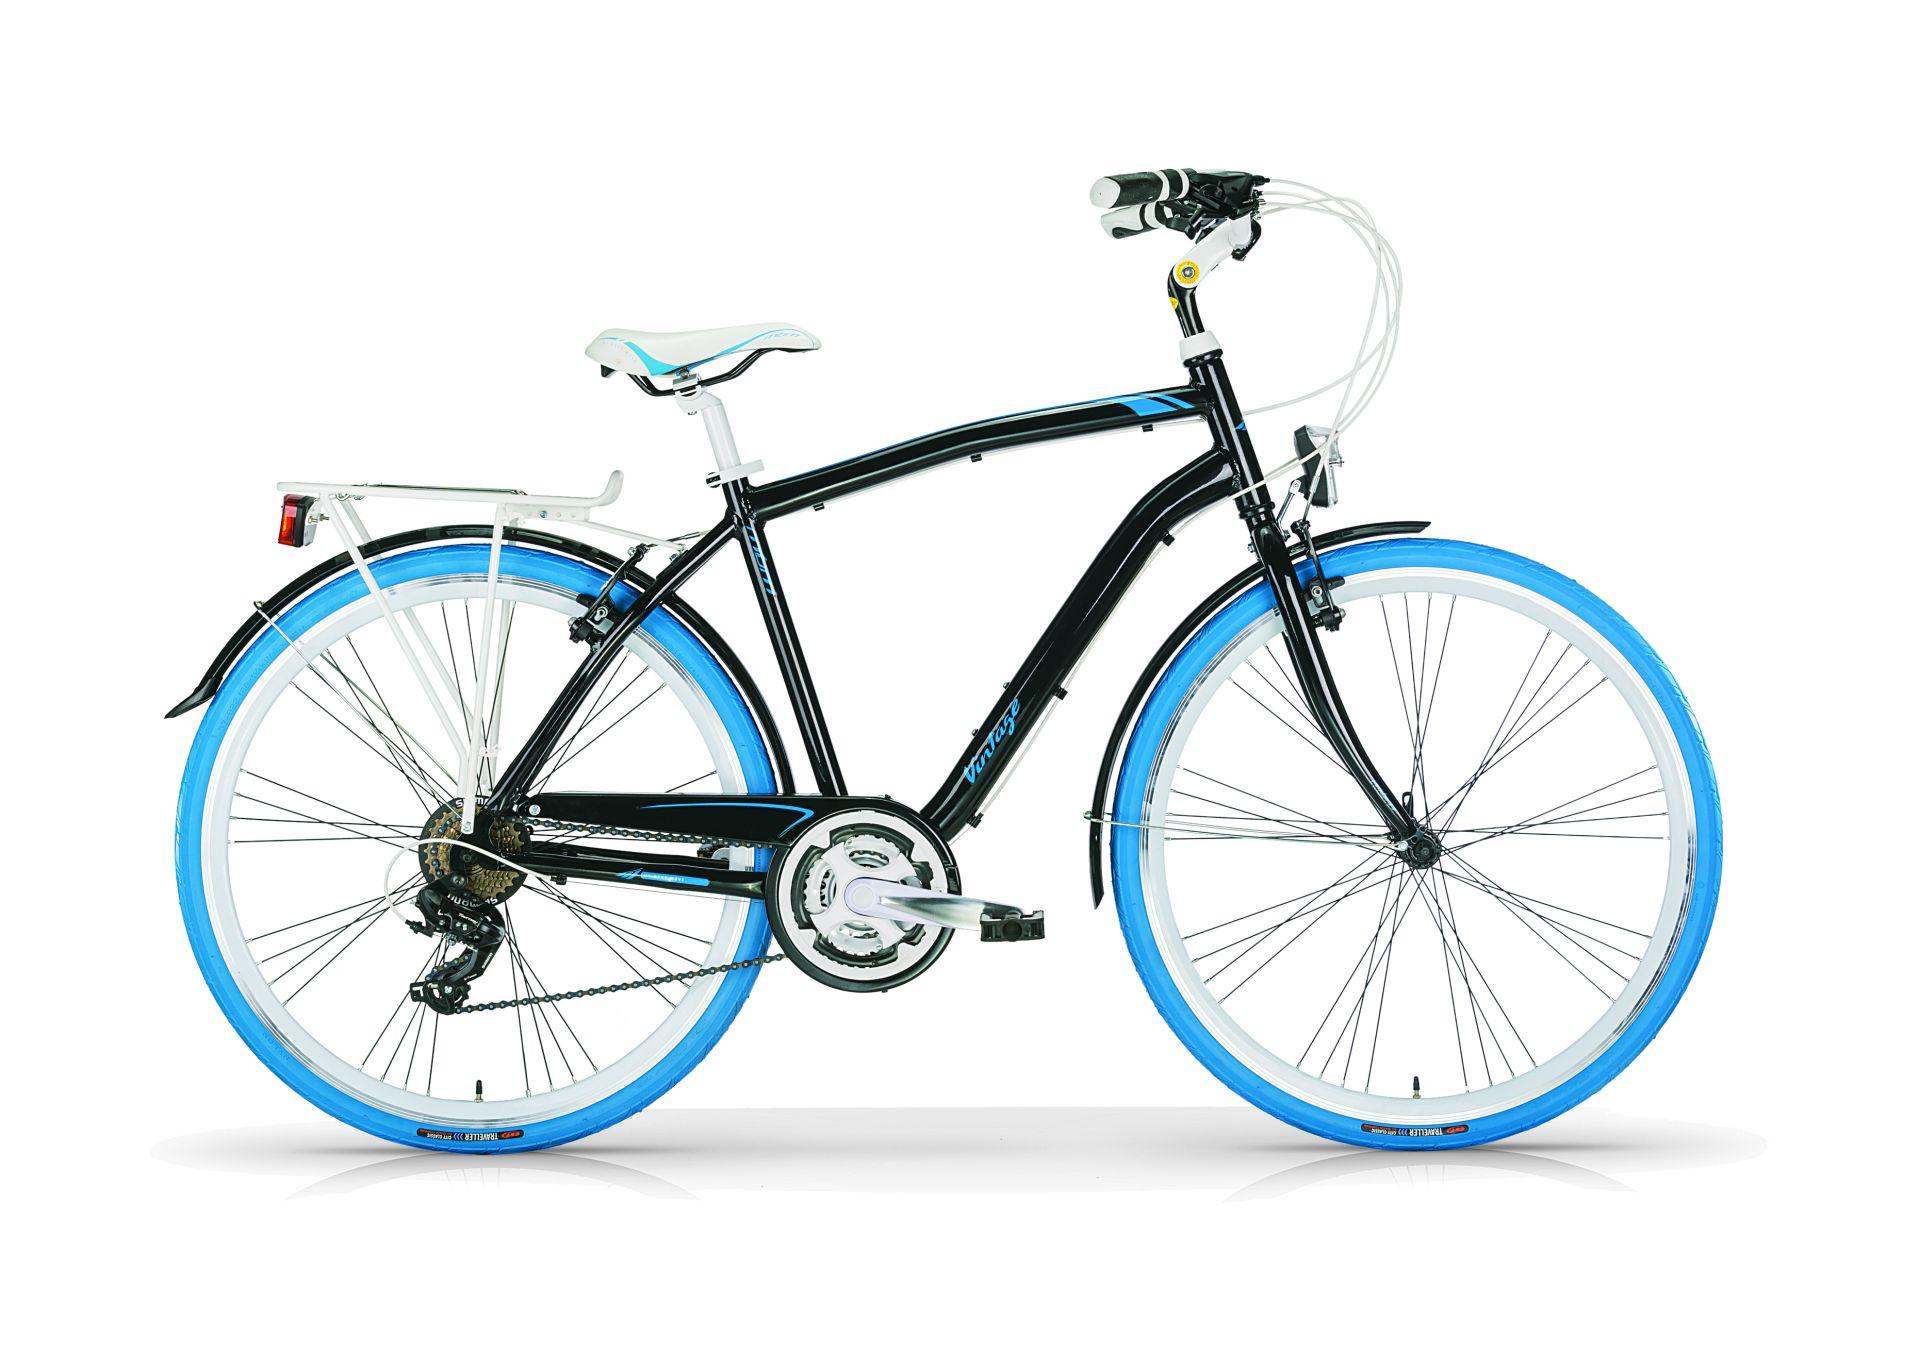 Bici Uomo Vintage Mbm 28 21v Alluminio